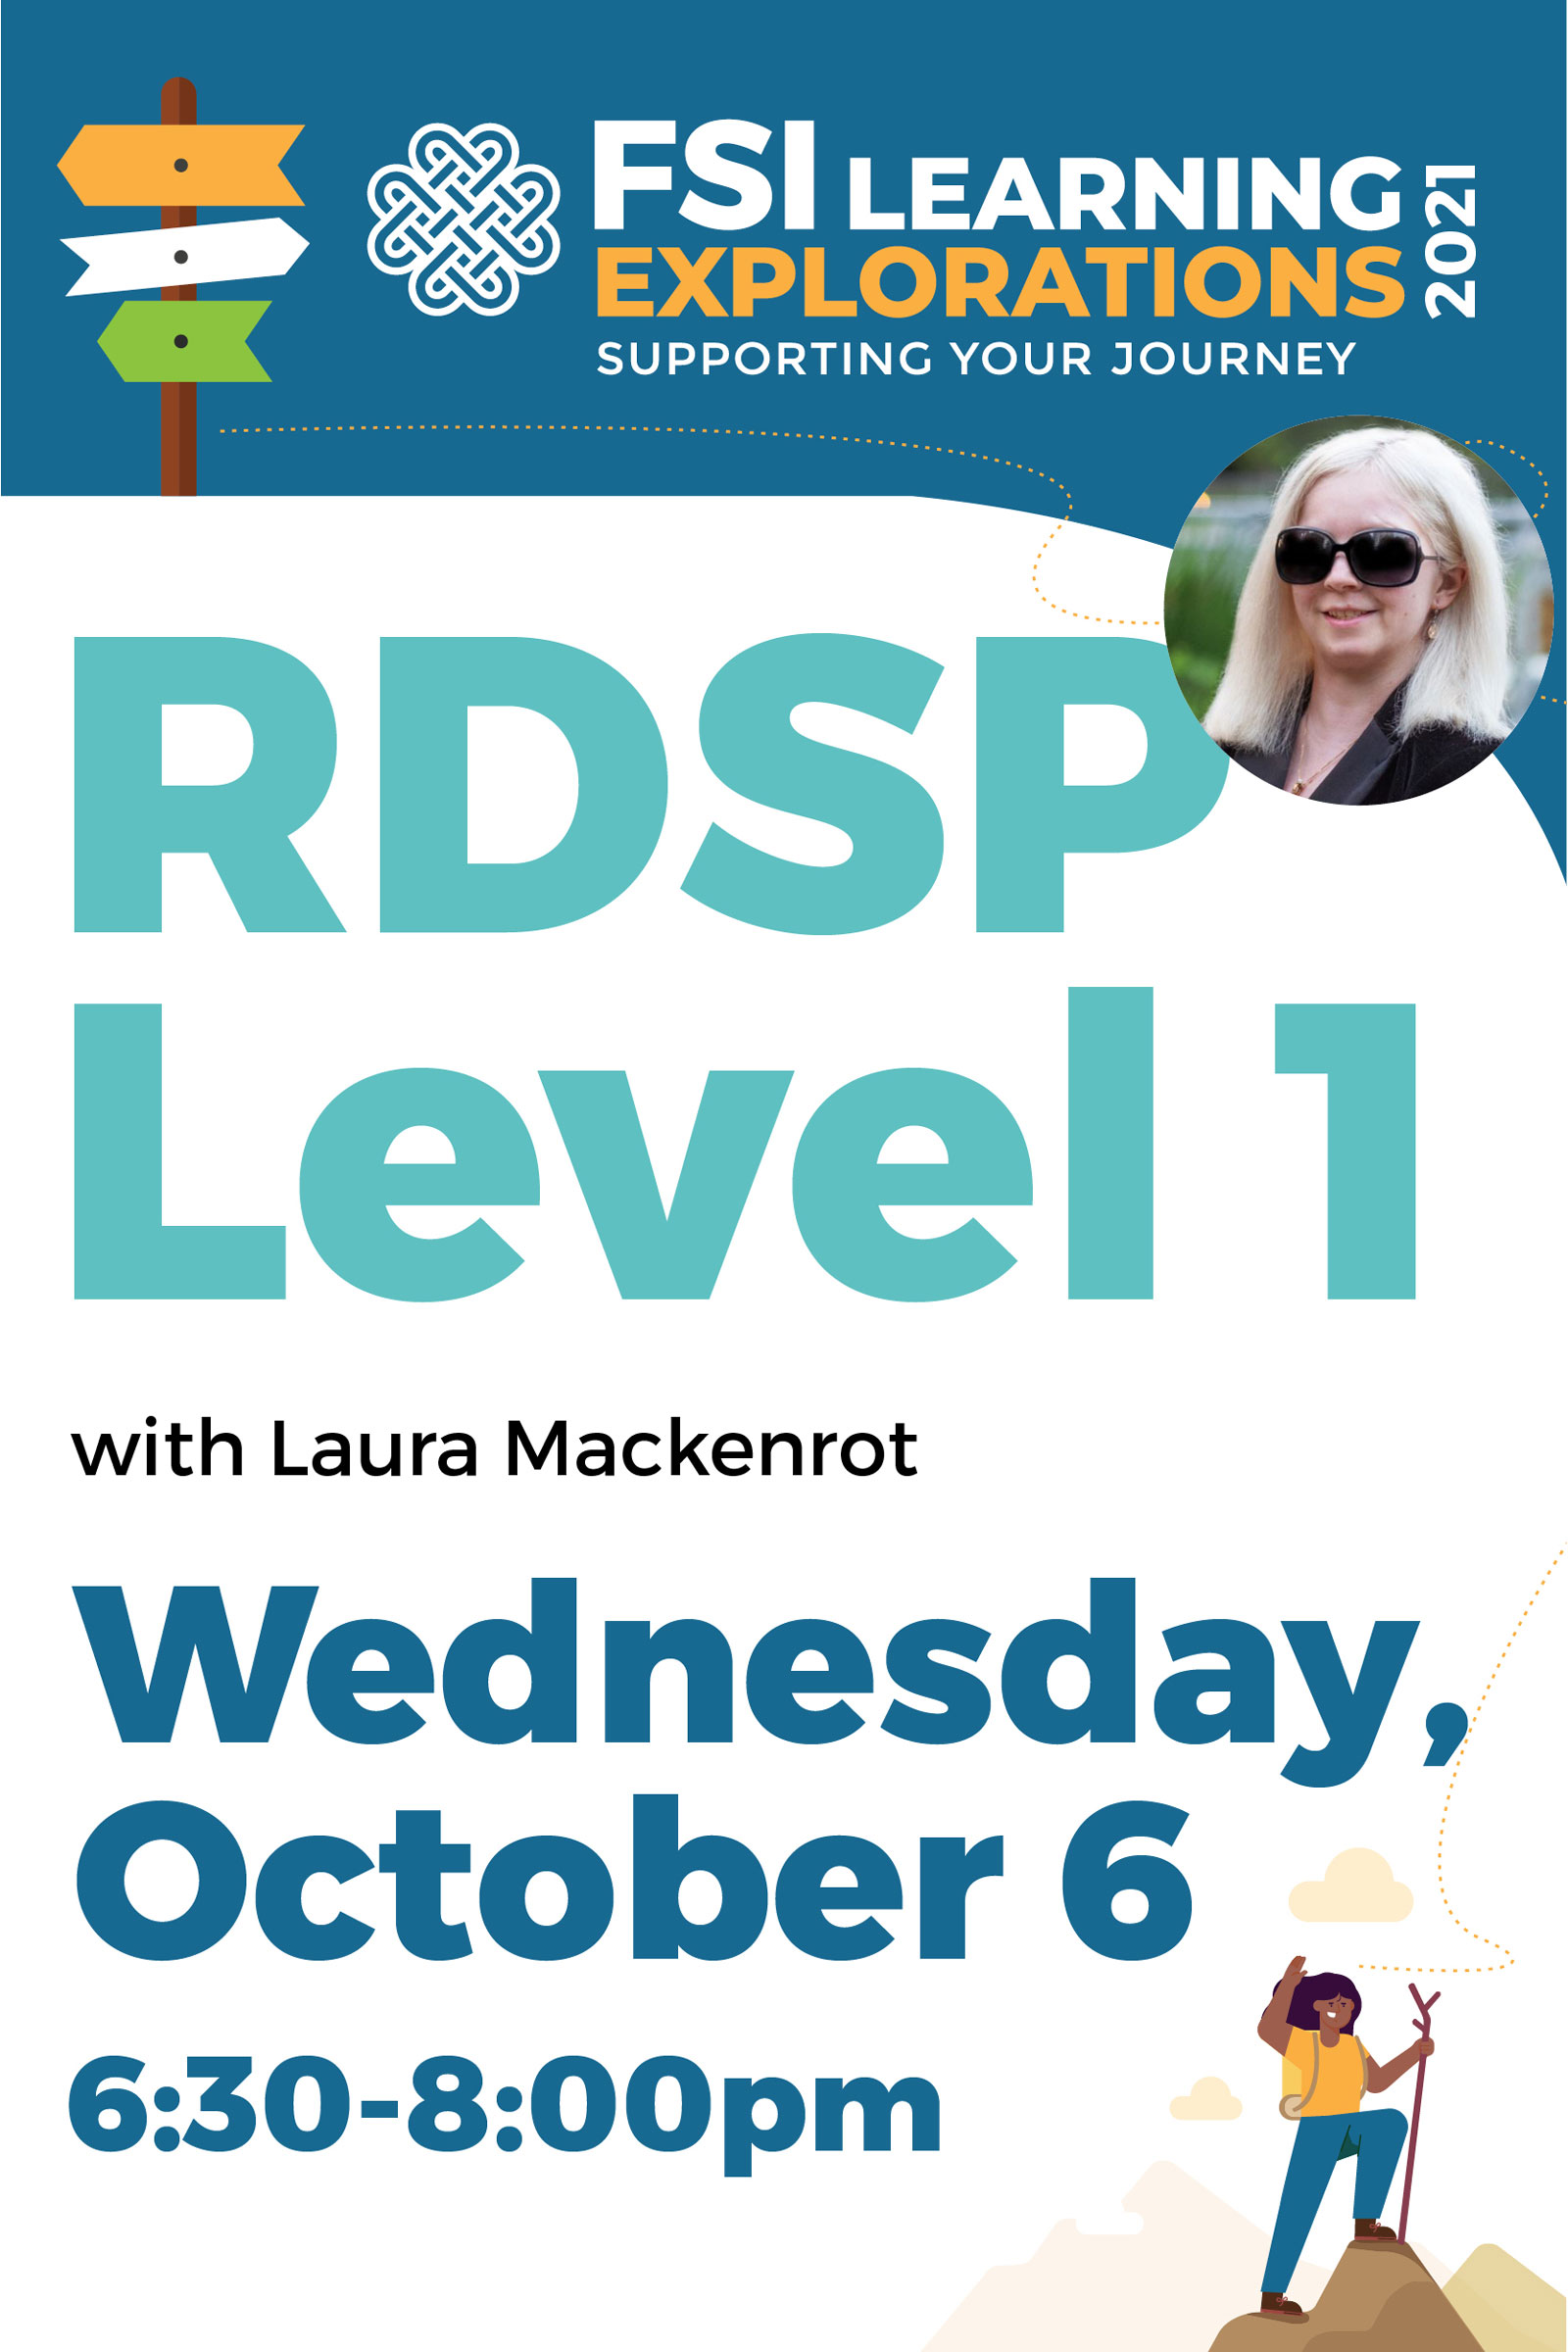 FSI Learning Explorations ~ RDSP Level 1